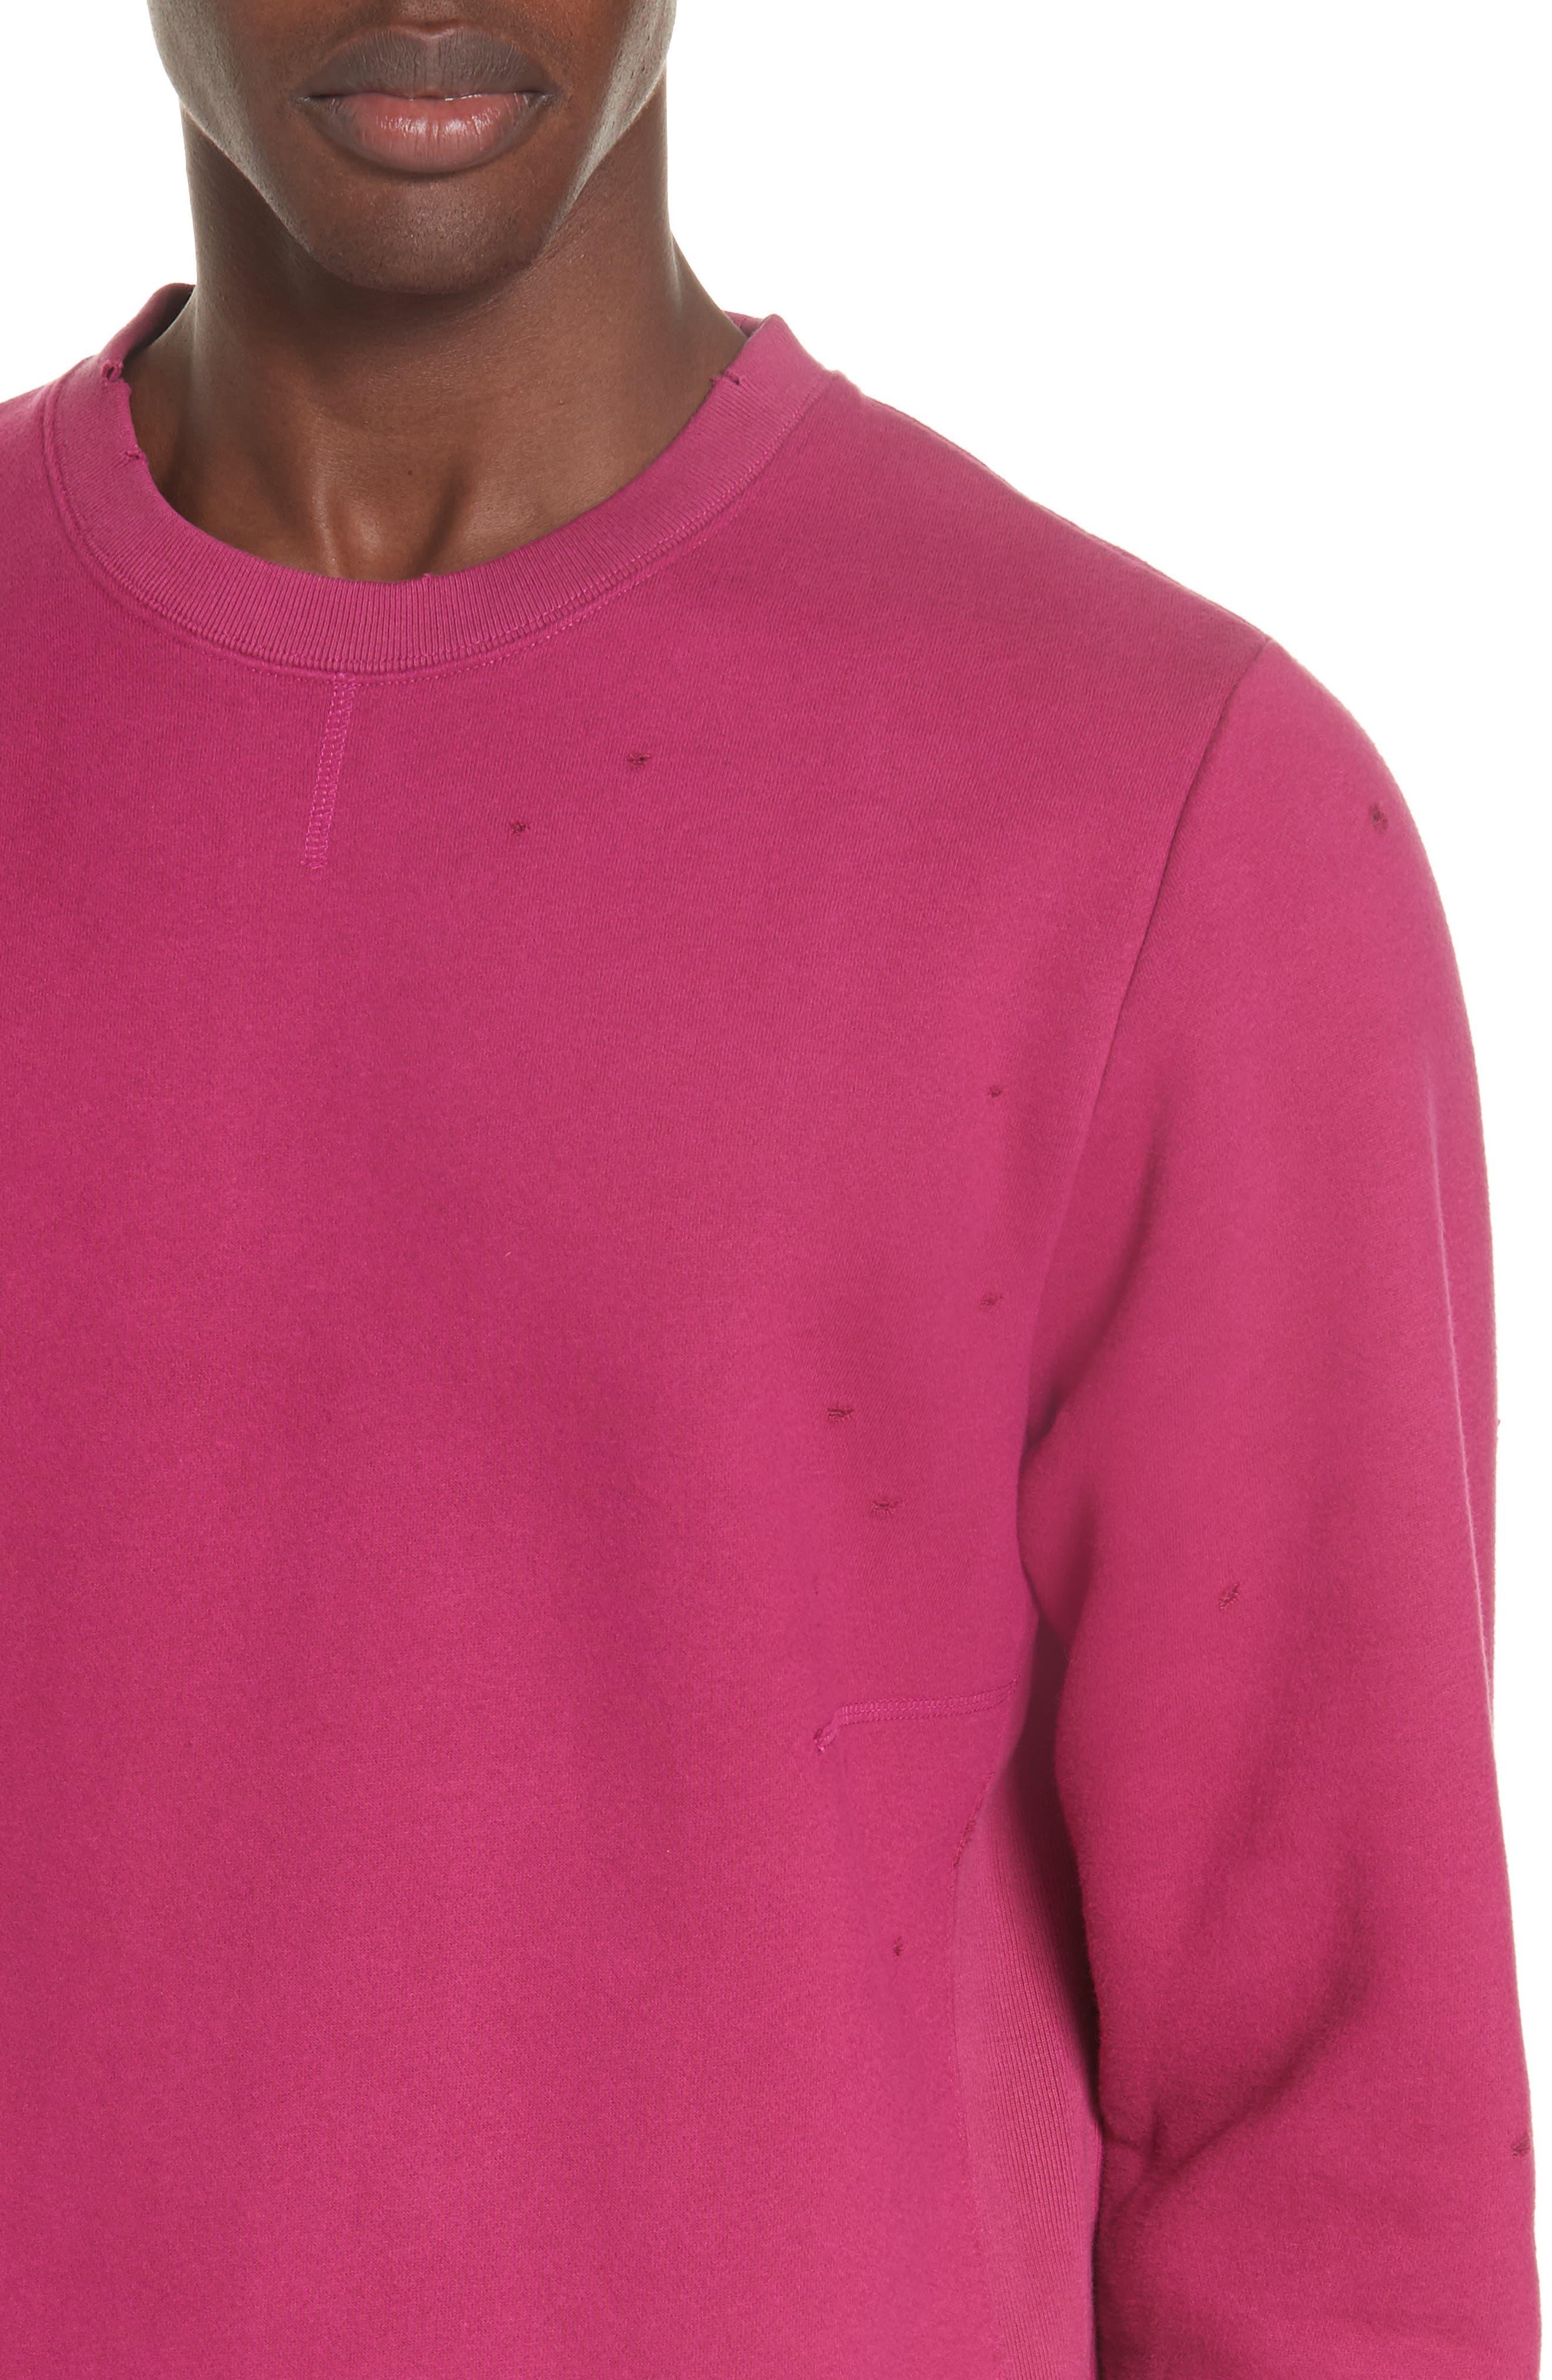 Distressed Crewneck Sweatshirt,                             Alternate thumbnail 4, color,                             RASBERRY